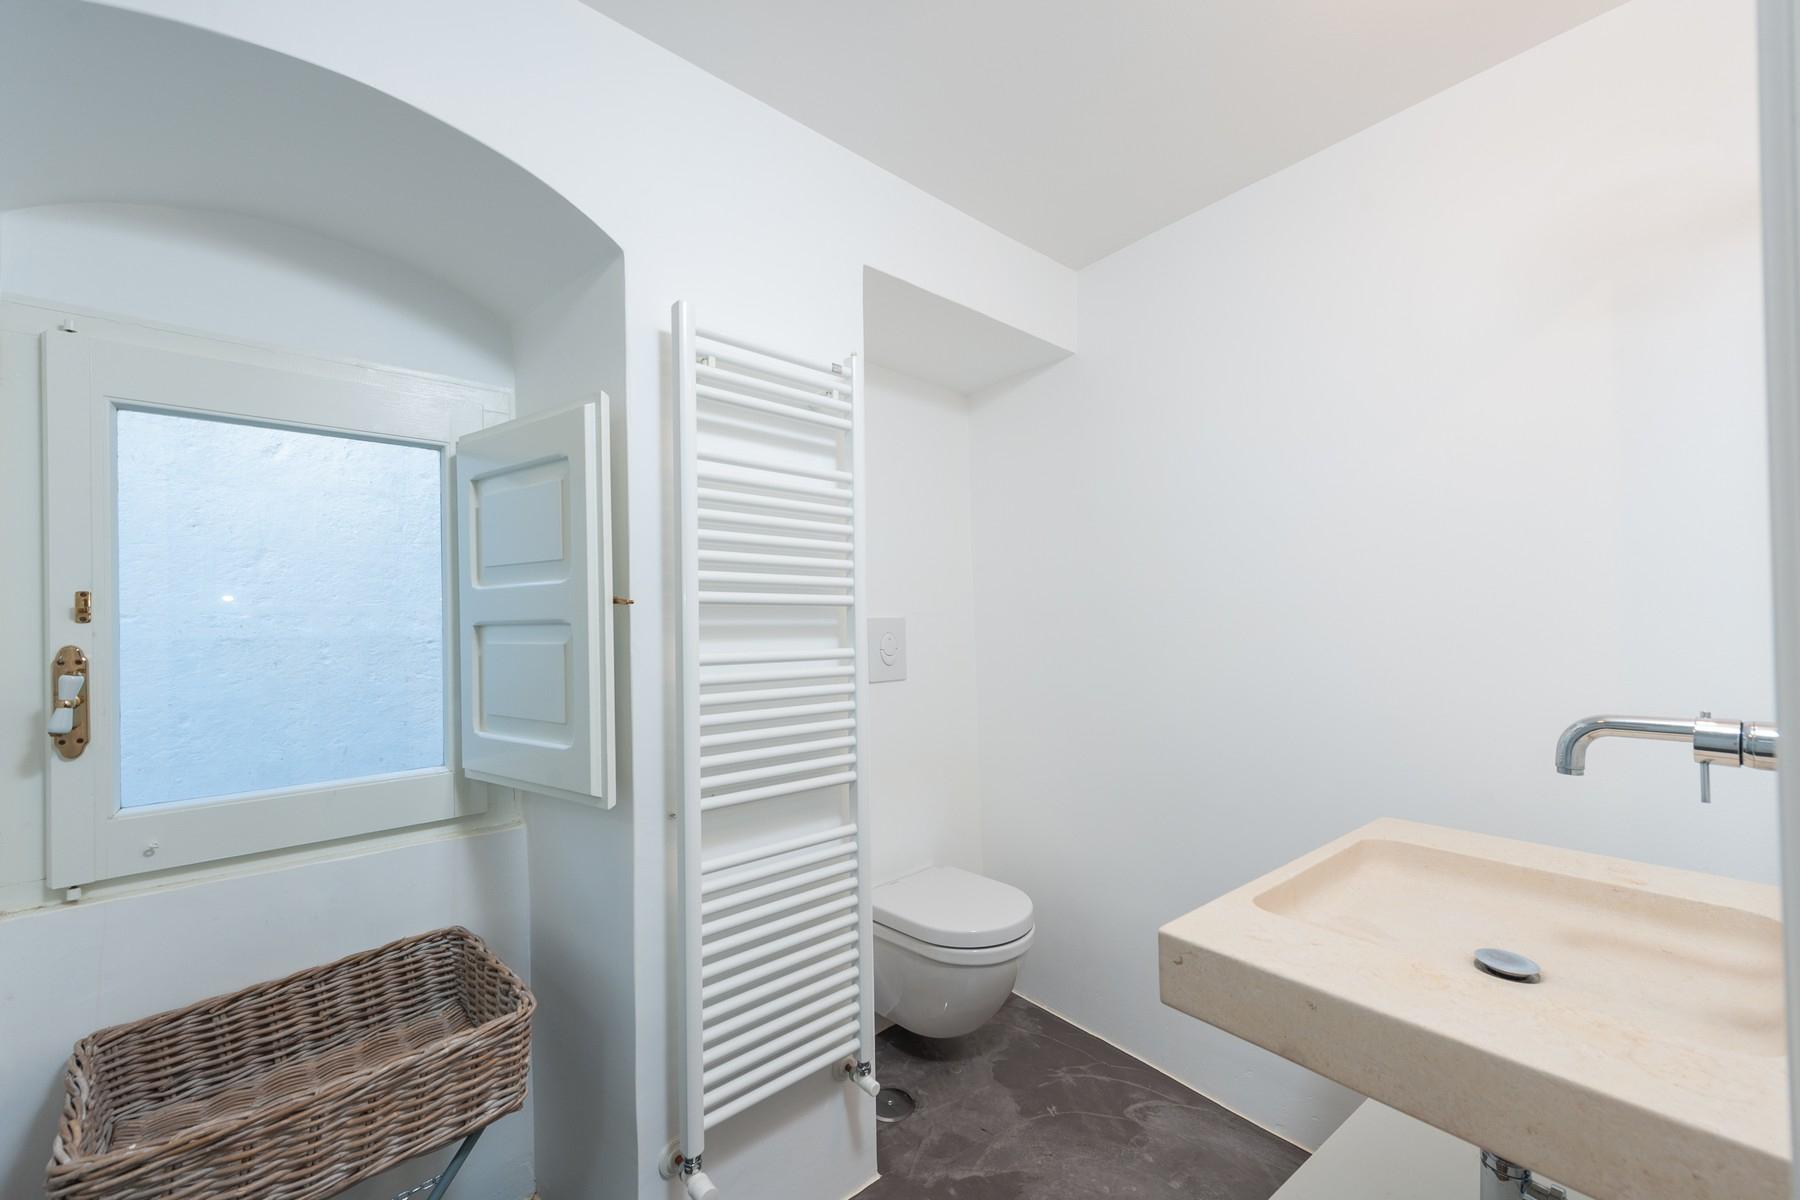 Appartamento in Vendita a Ostuni: 5 locali, 265 mq - Foto 16